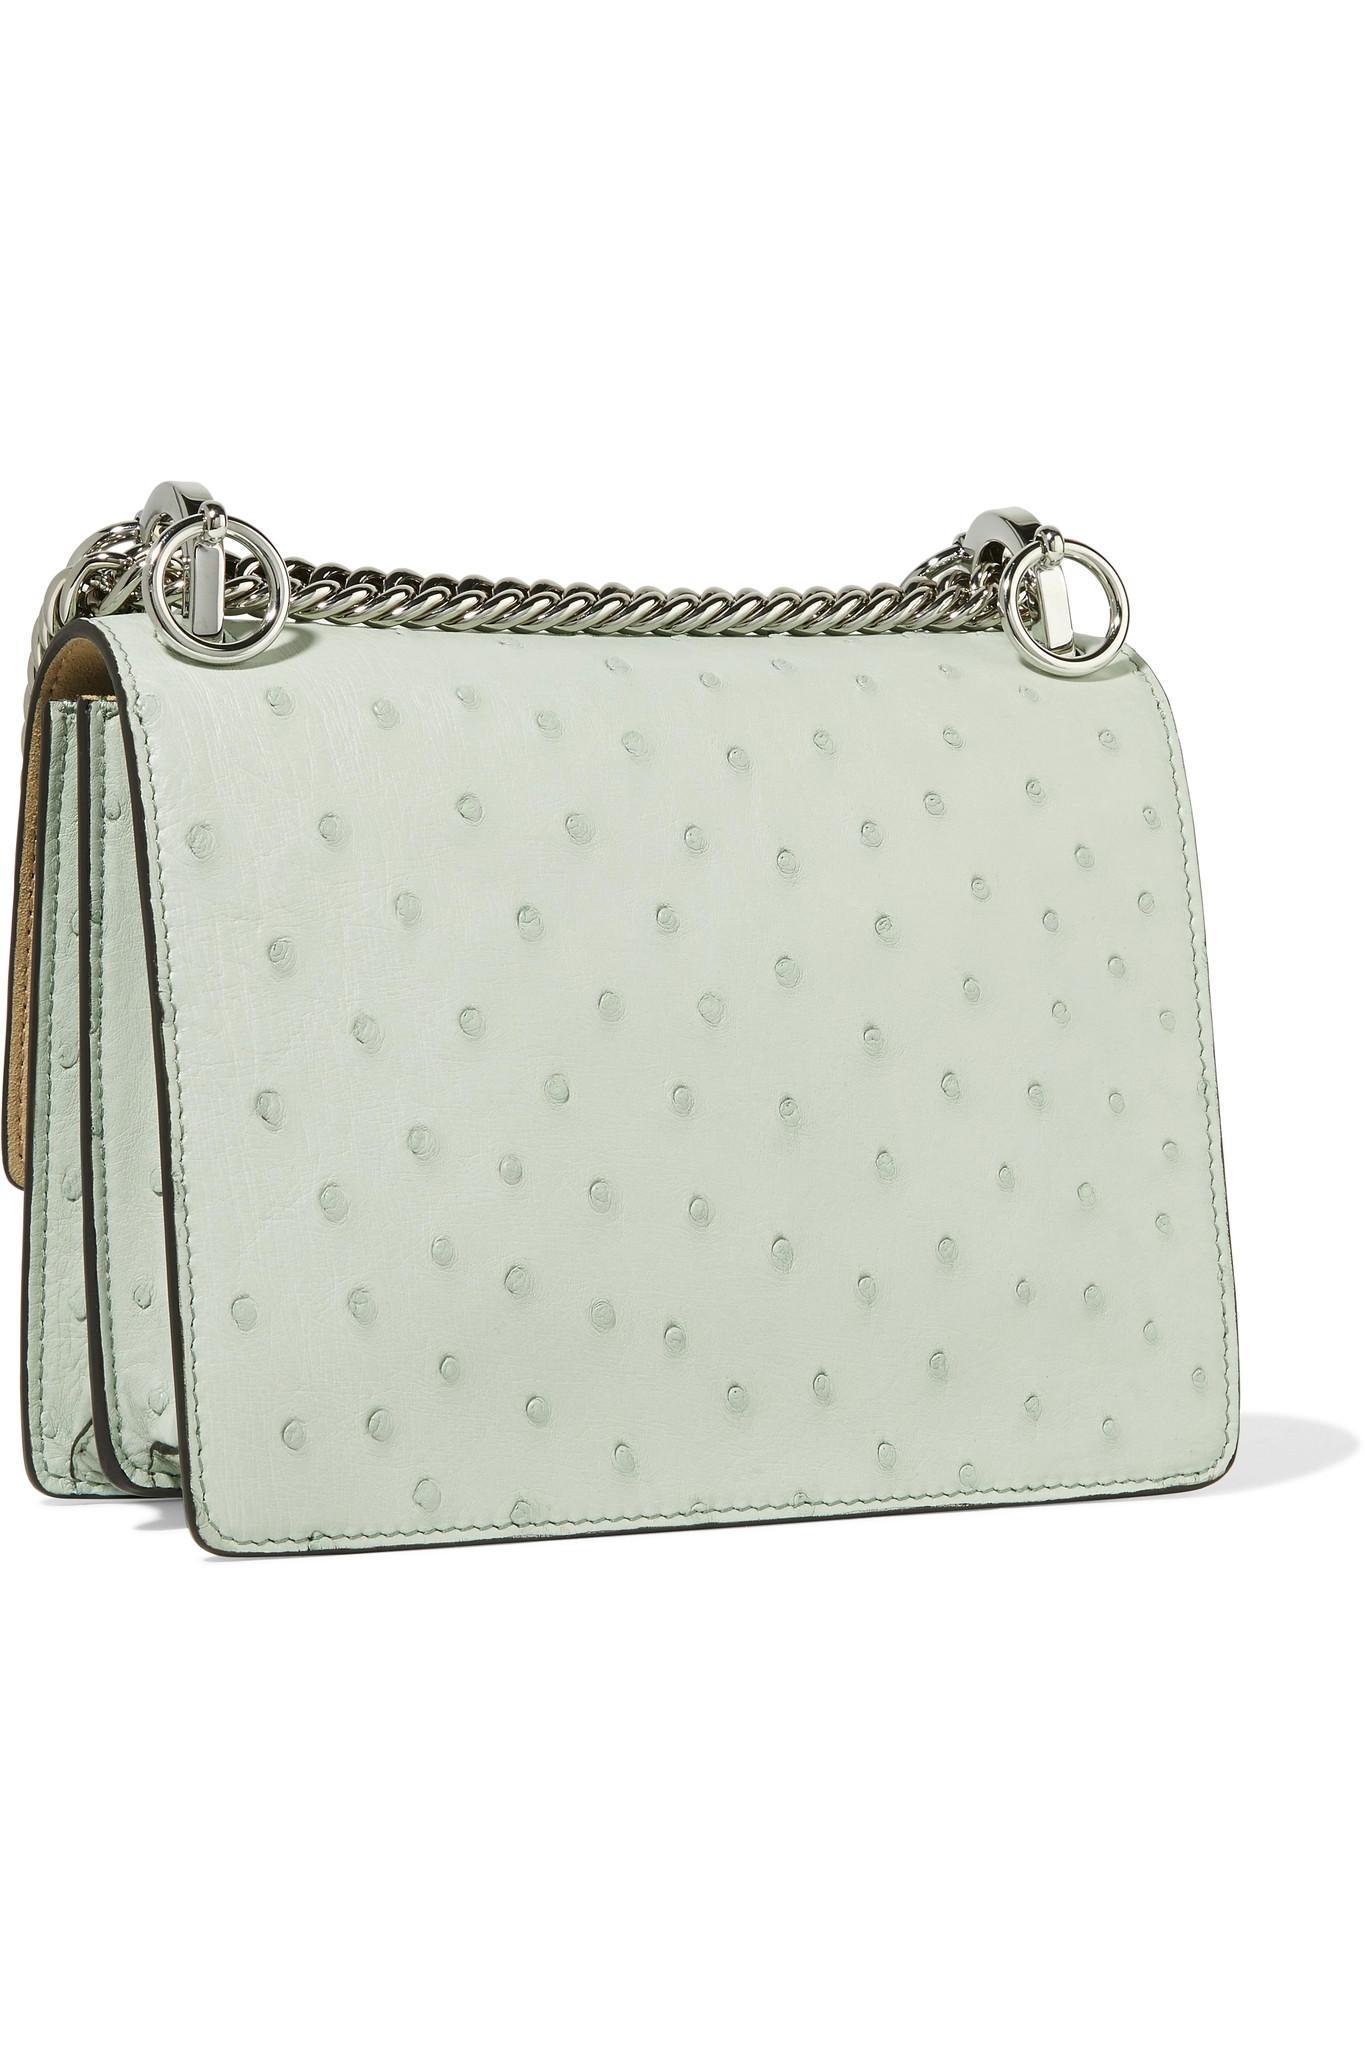 Fendi - Multicolor Kan I Small Ostrich Shoulder Bag - Lyst. View fullscreen 9623e4a95e6e6